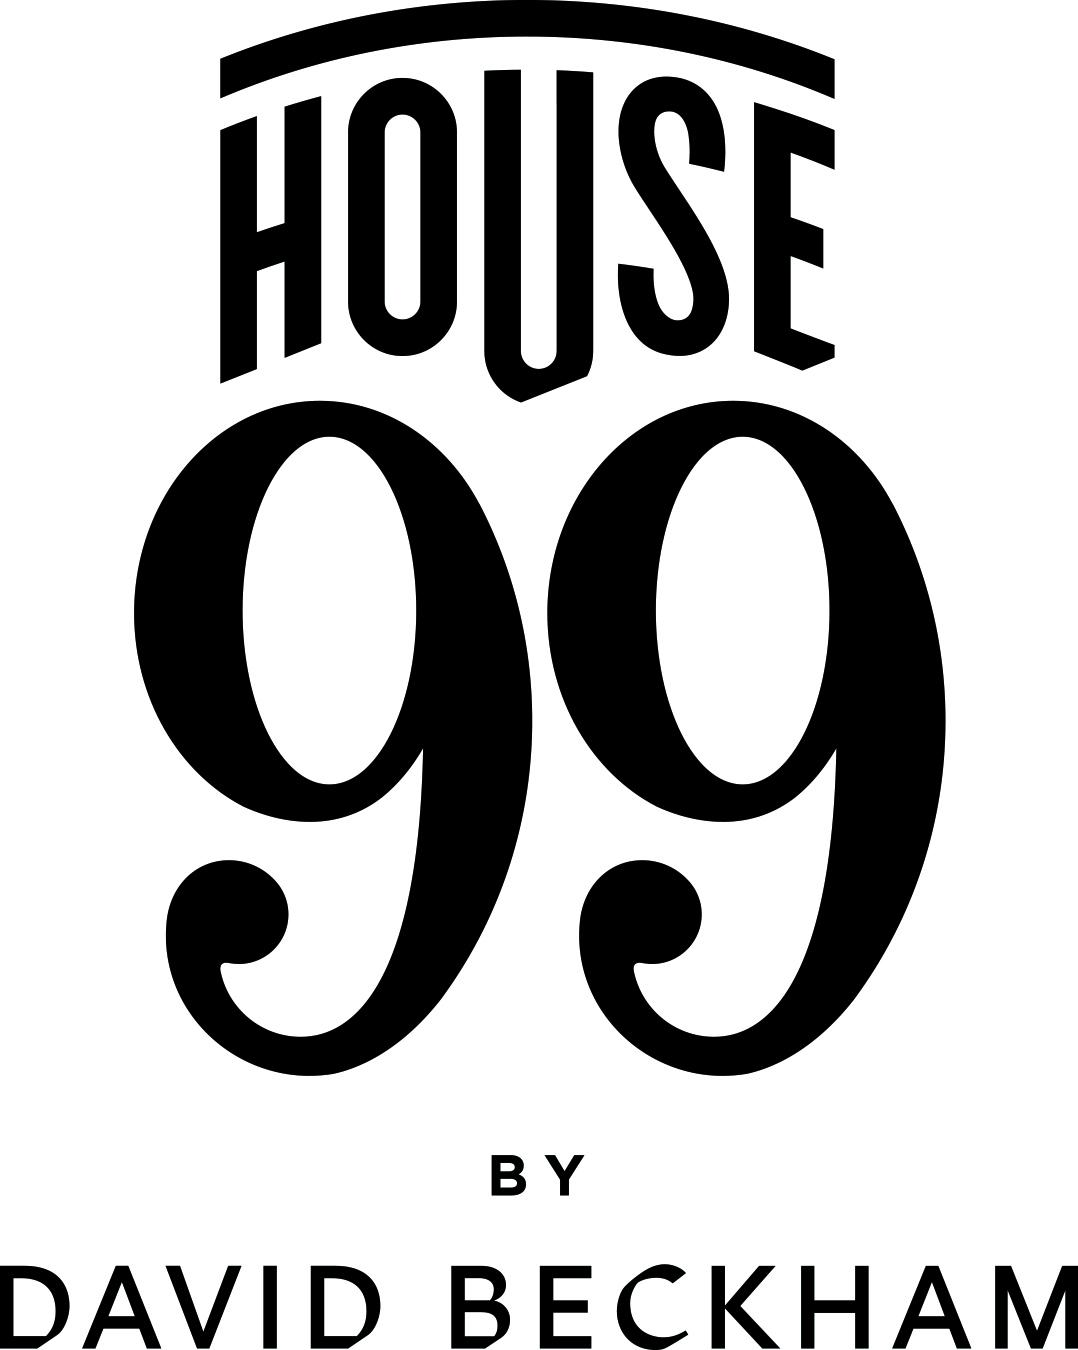 House99 by David Beckham